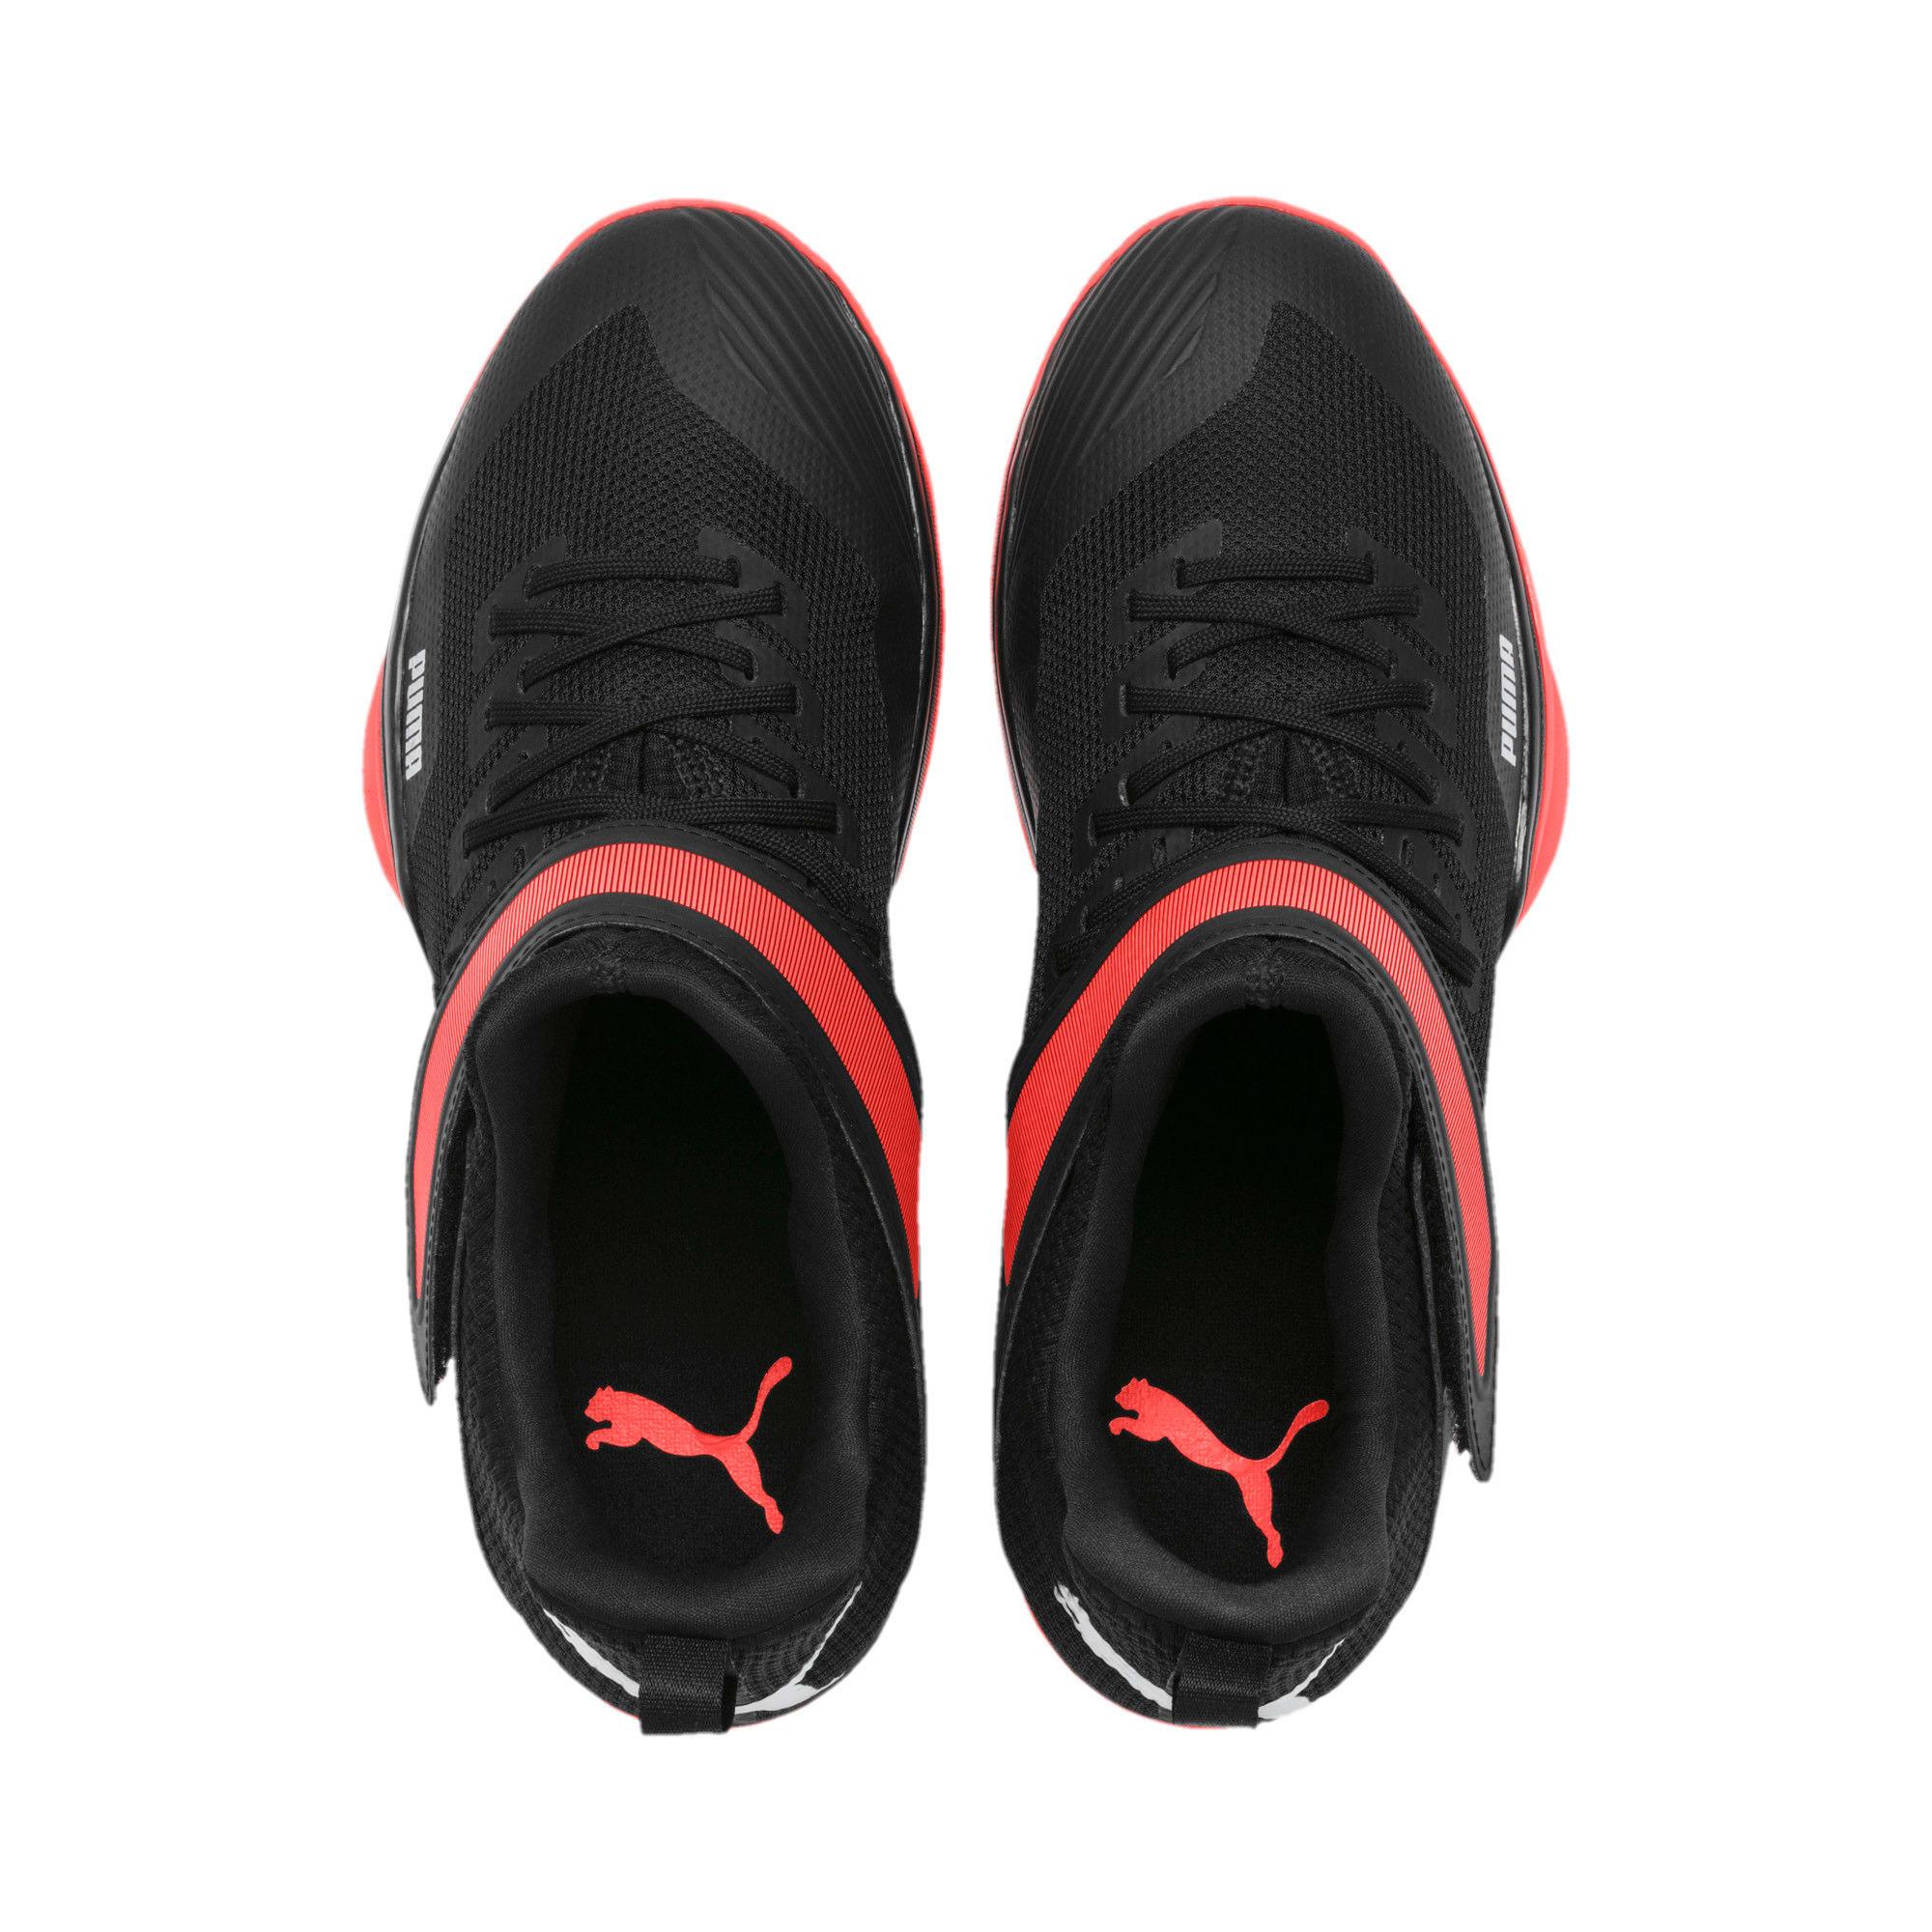 Thumbnail 7 of Rise XT3 Handball Shoes, Puma Black-Silver-Nrgy Red, medium